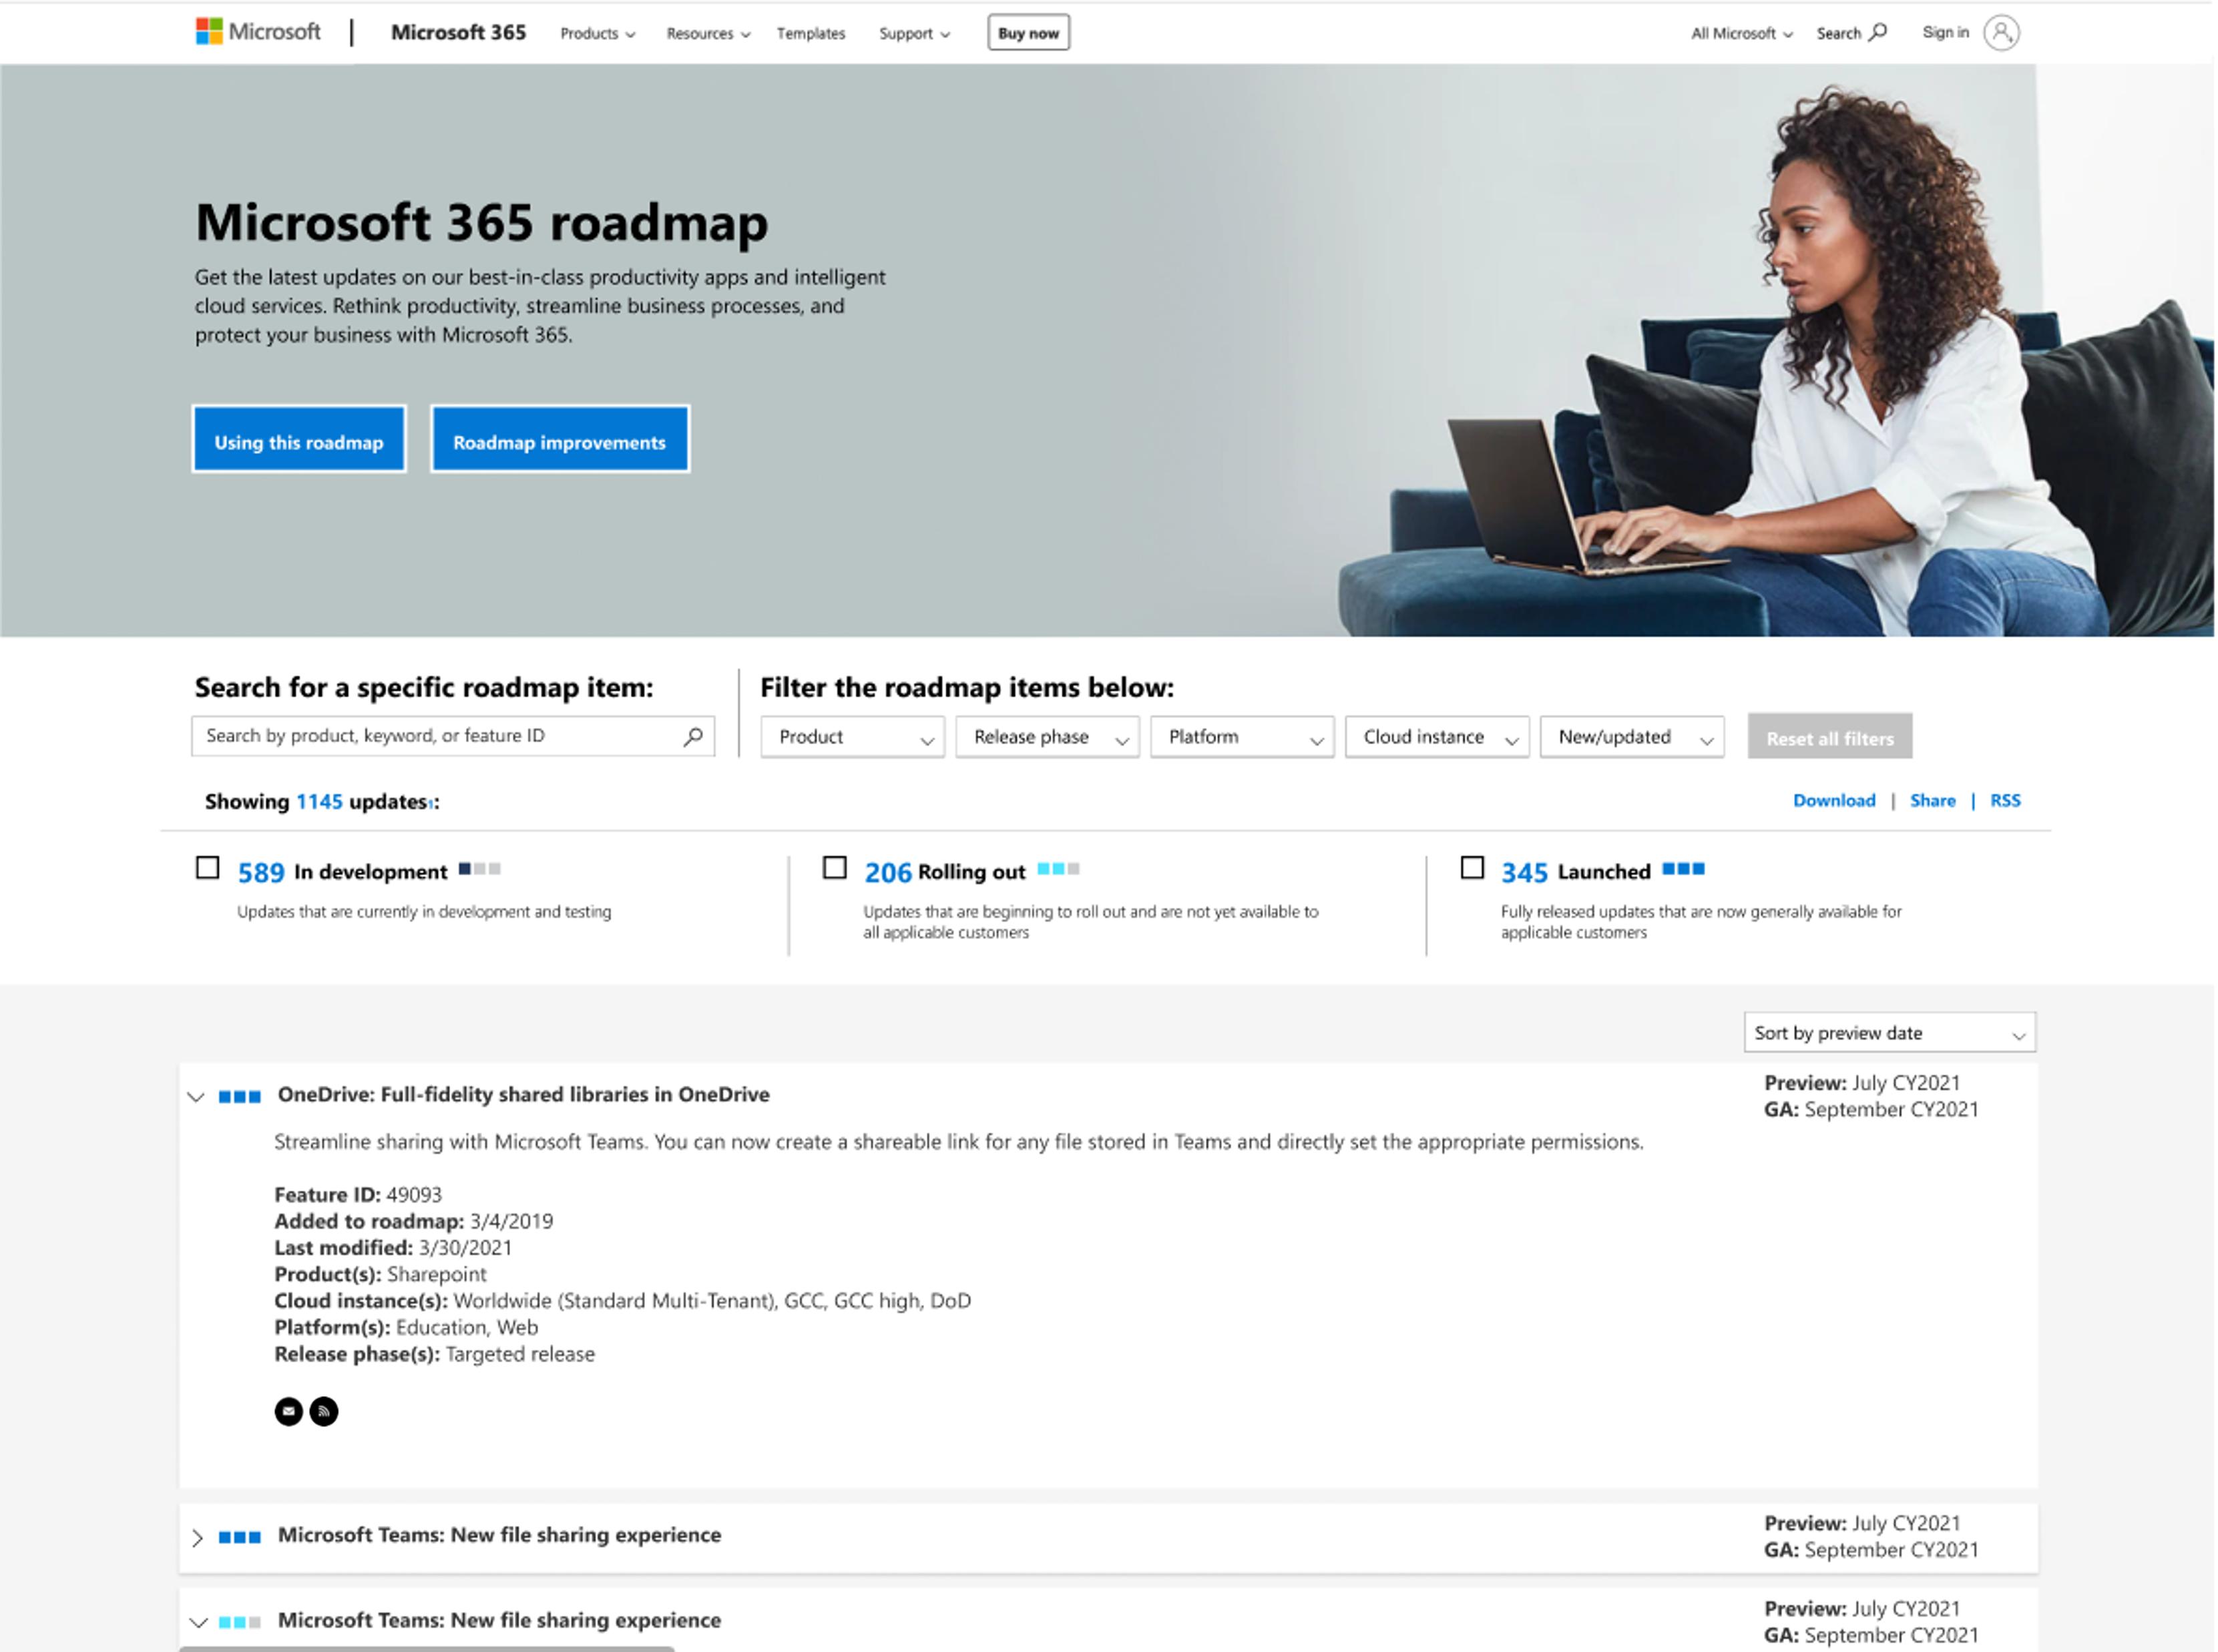 Microsoft 365 roadmap site updates